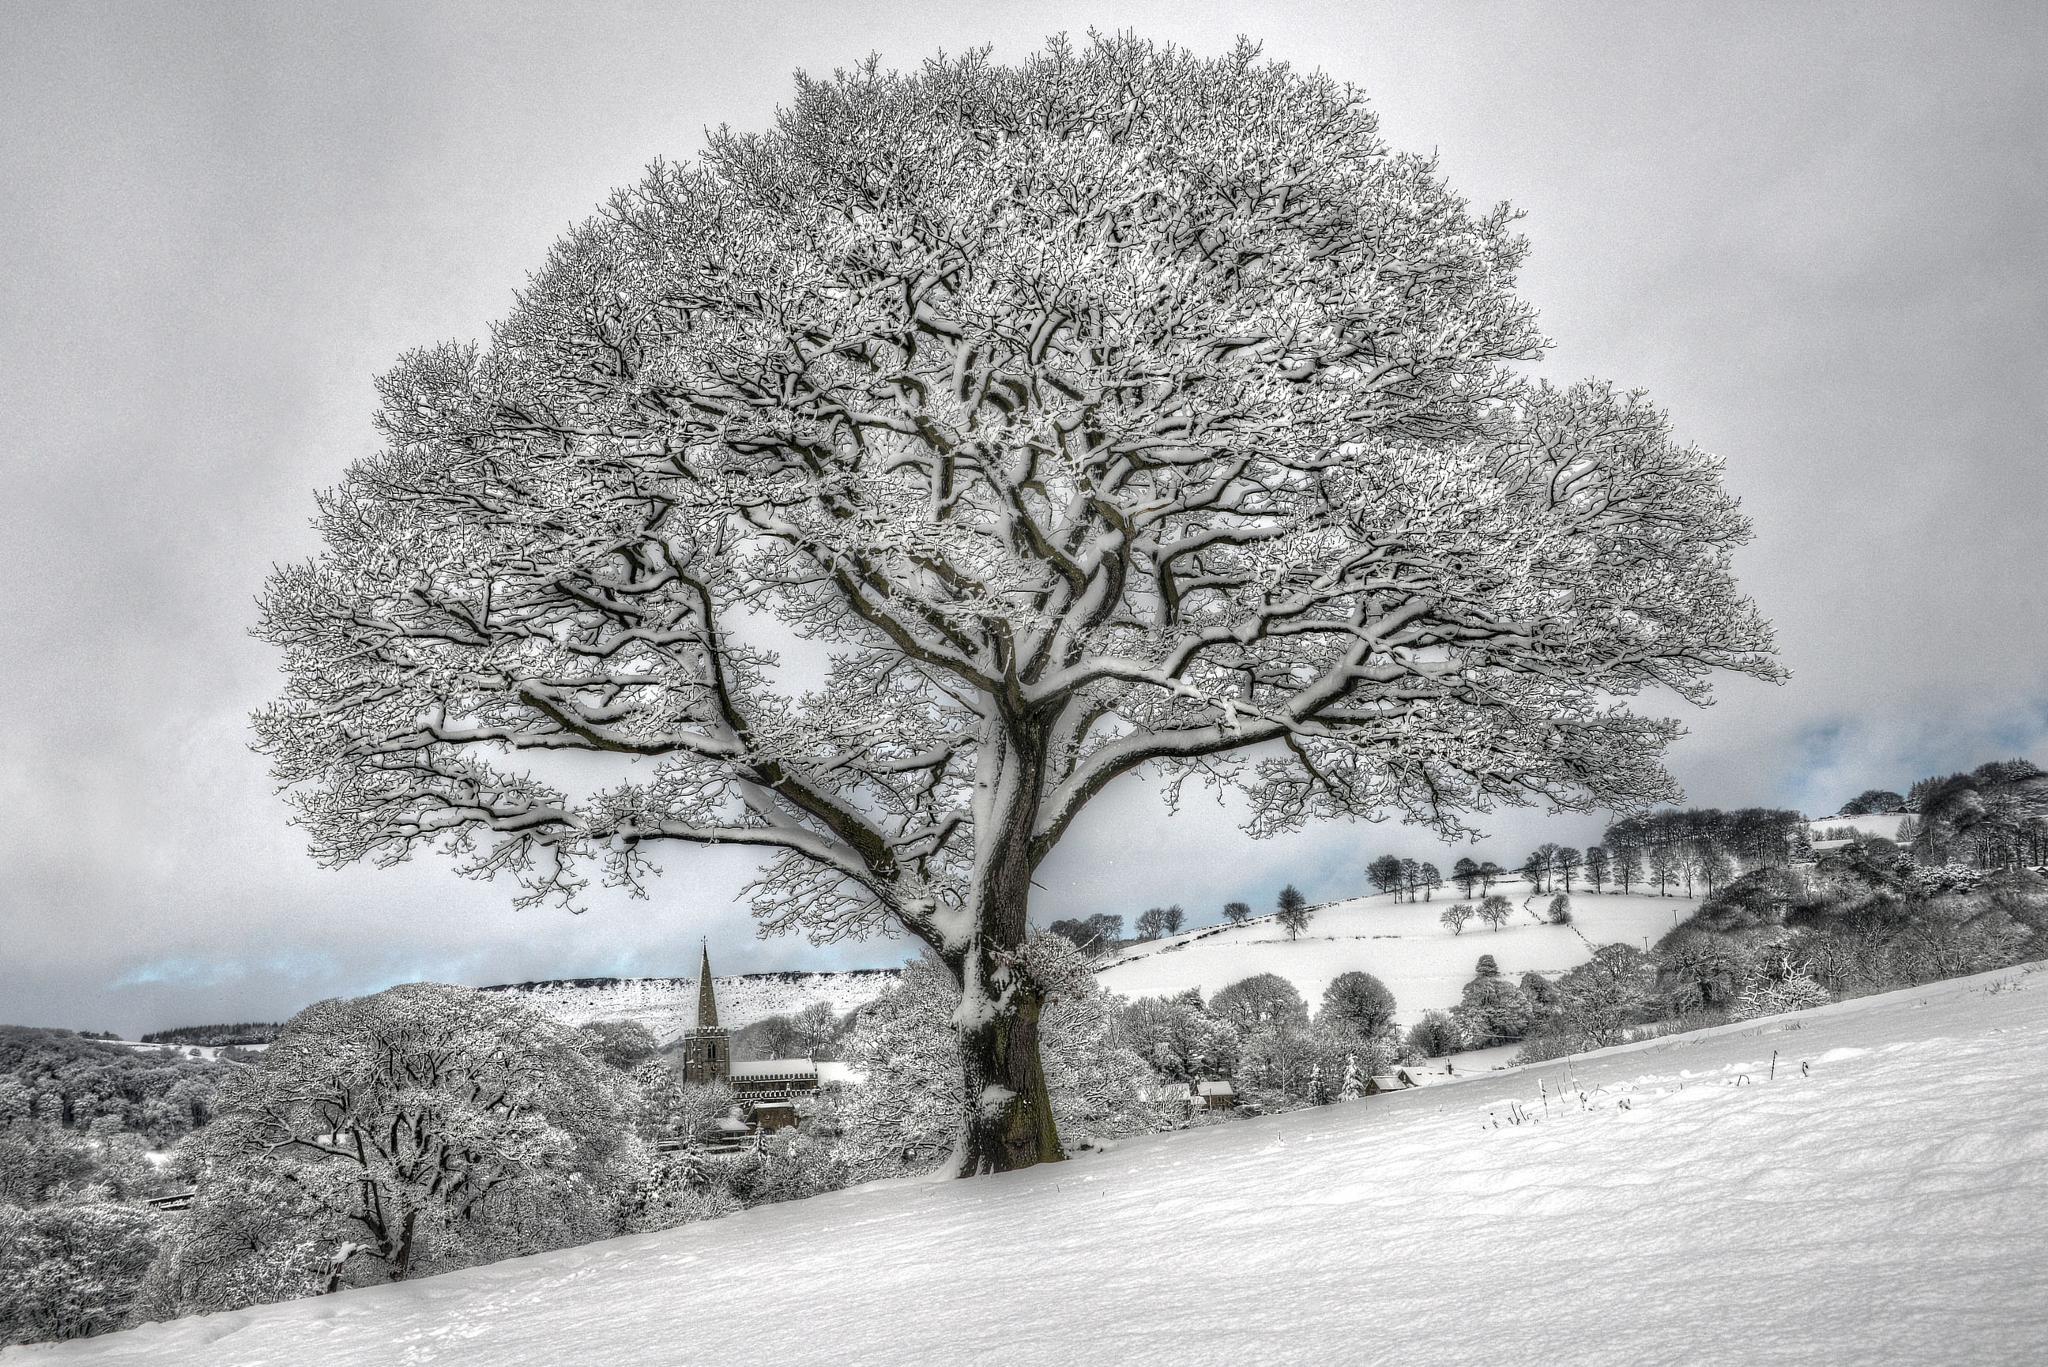 Snowy Tree by SimonBull